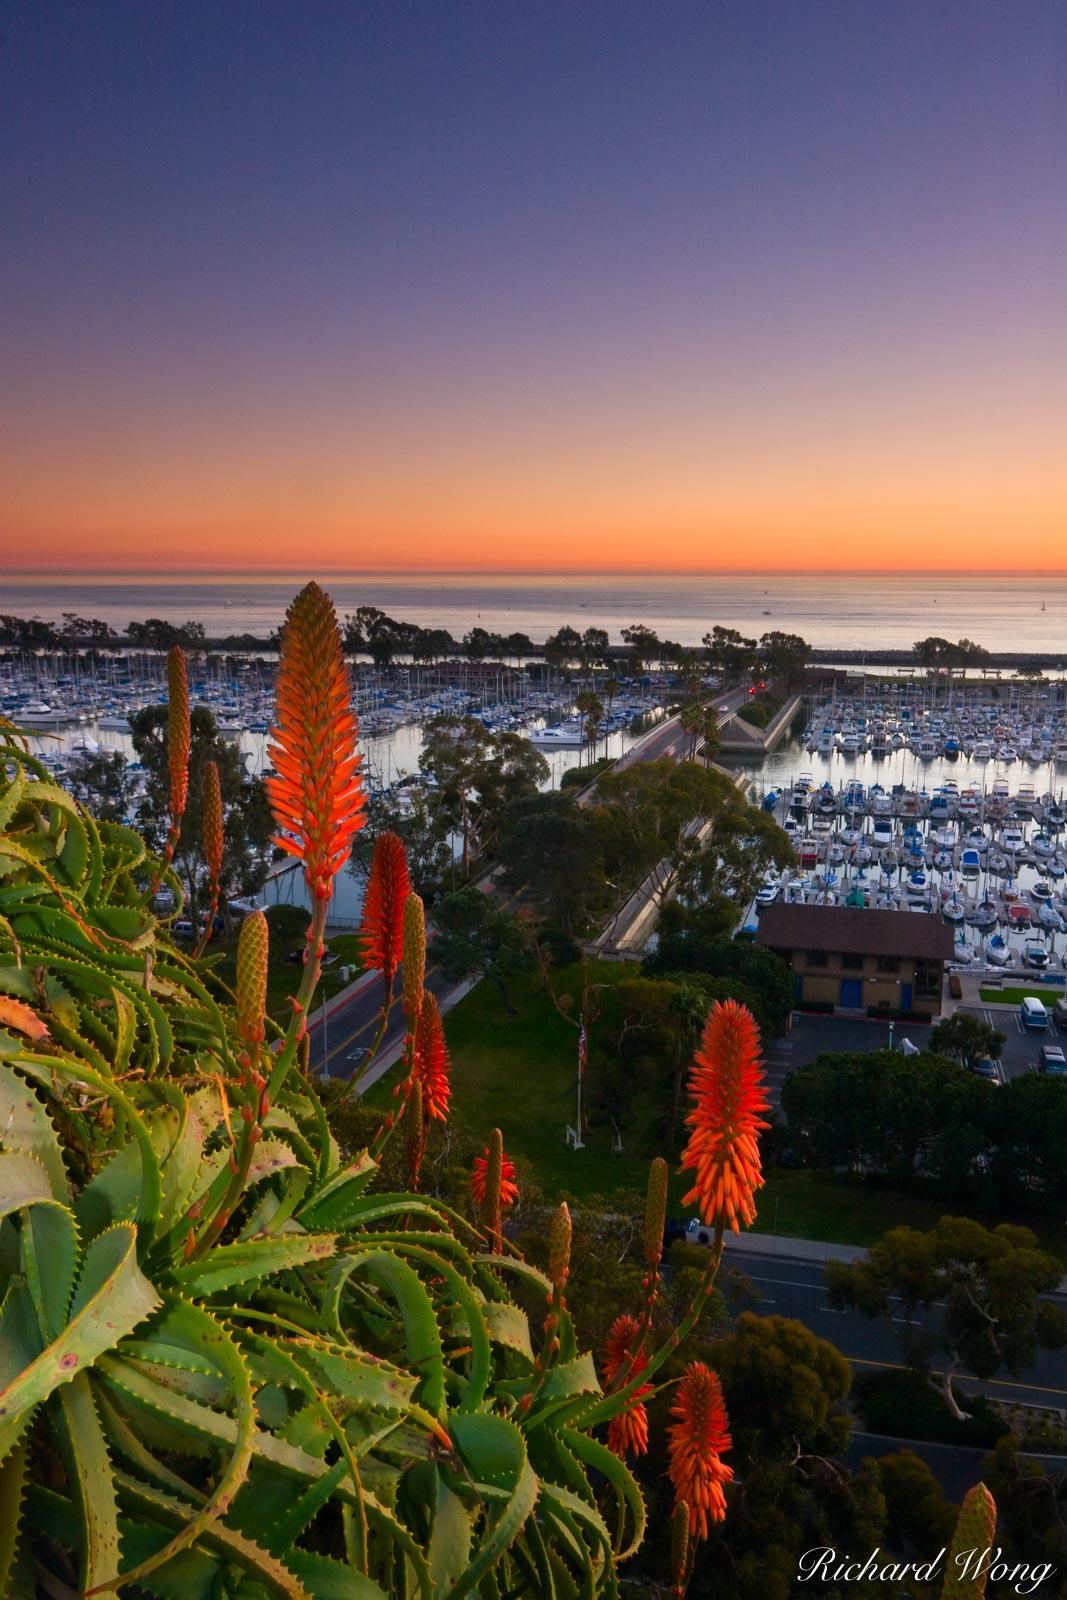 Aloe Vera Flowers and Dana Point Harbor Scenic Vista, Orange County, California, photo, photo